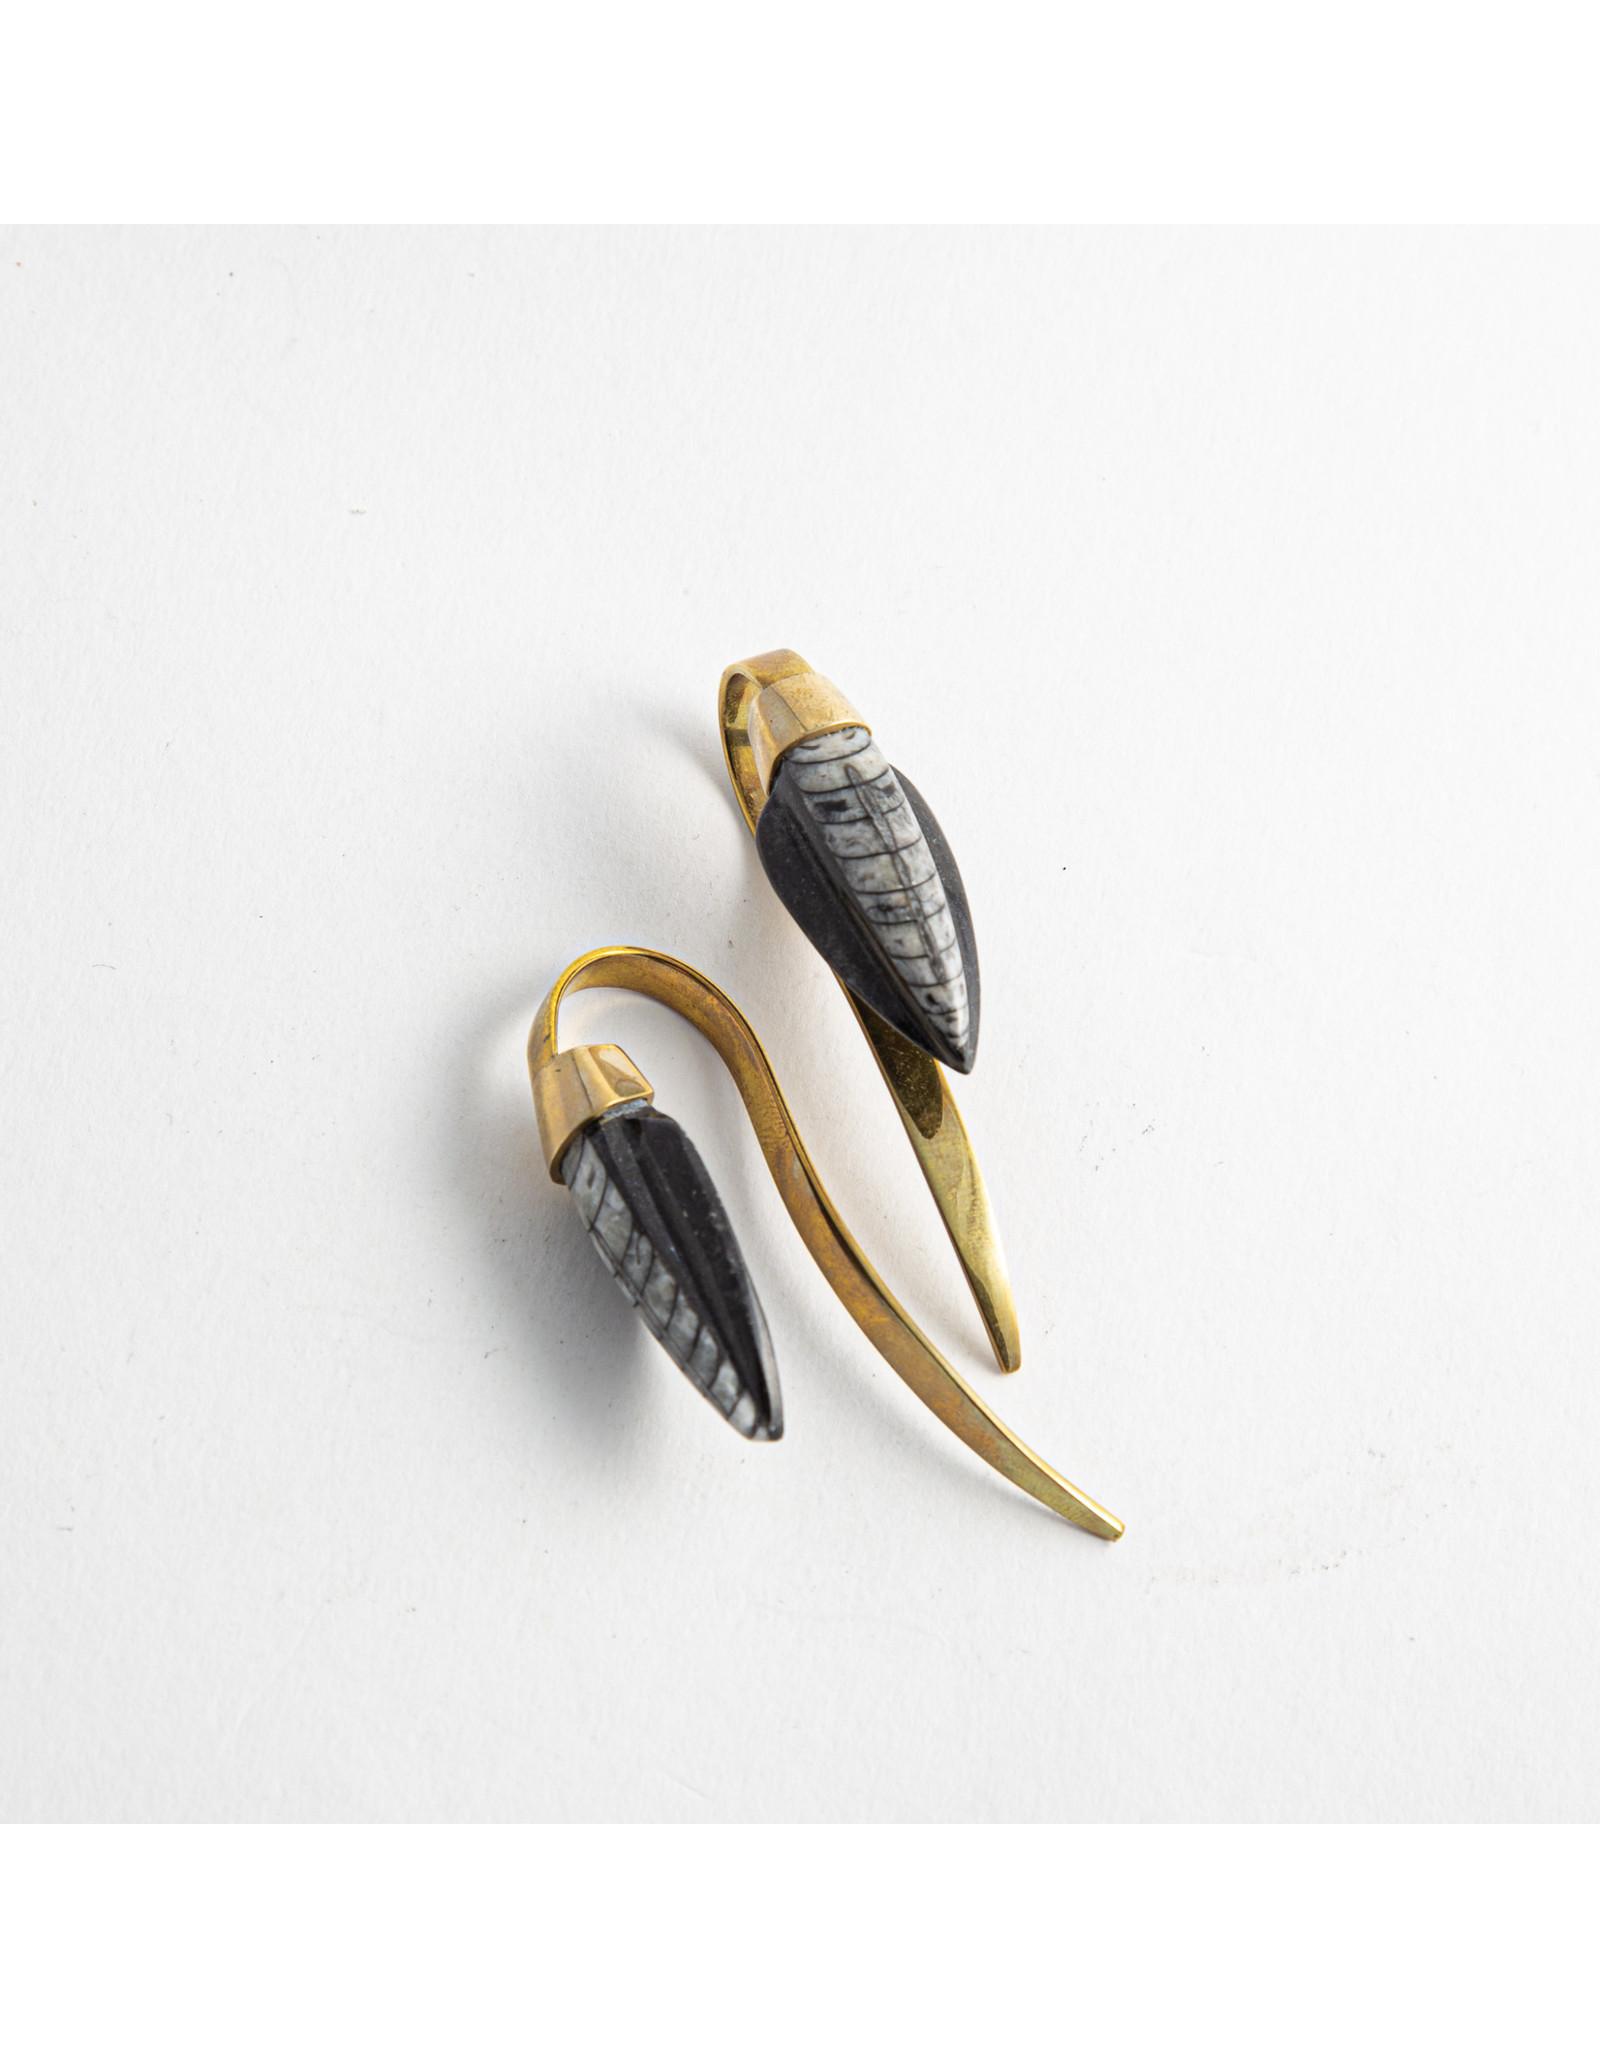 Quetzalli jewelry Quetzalli brass nautilus coil hanging design